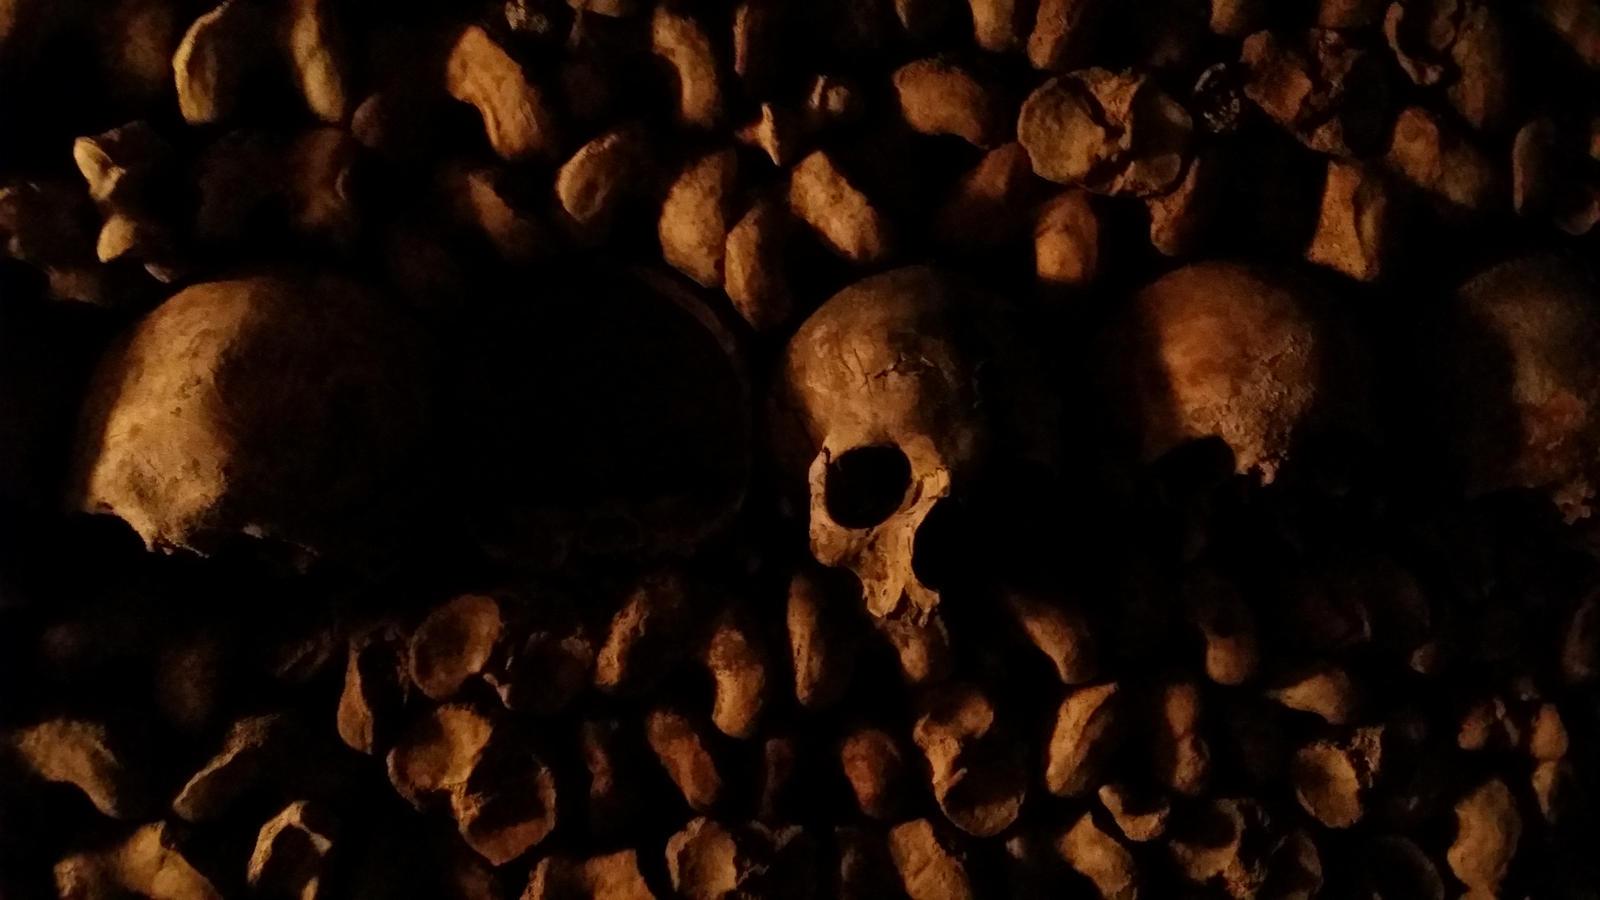 Paris catacombes 1 by alphazentaurus